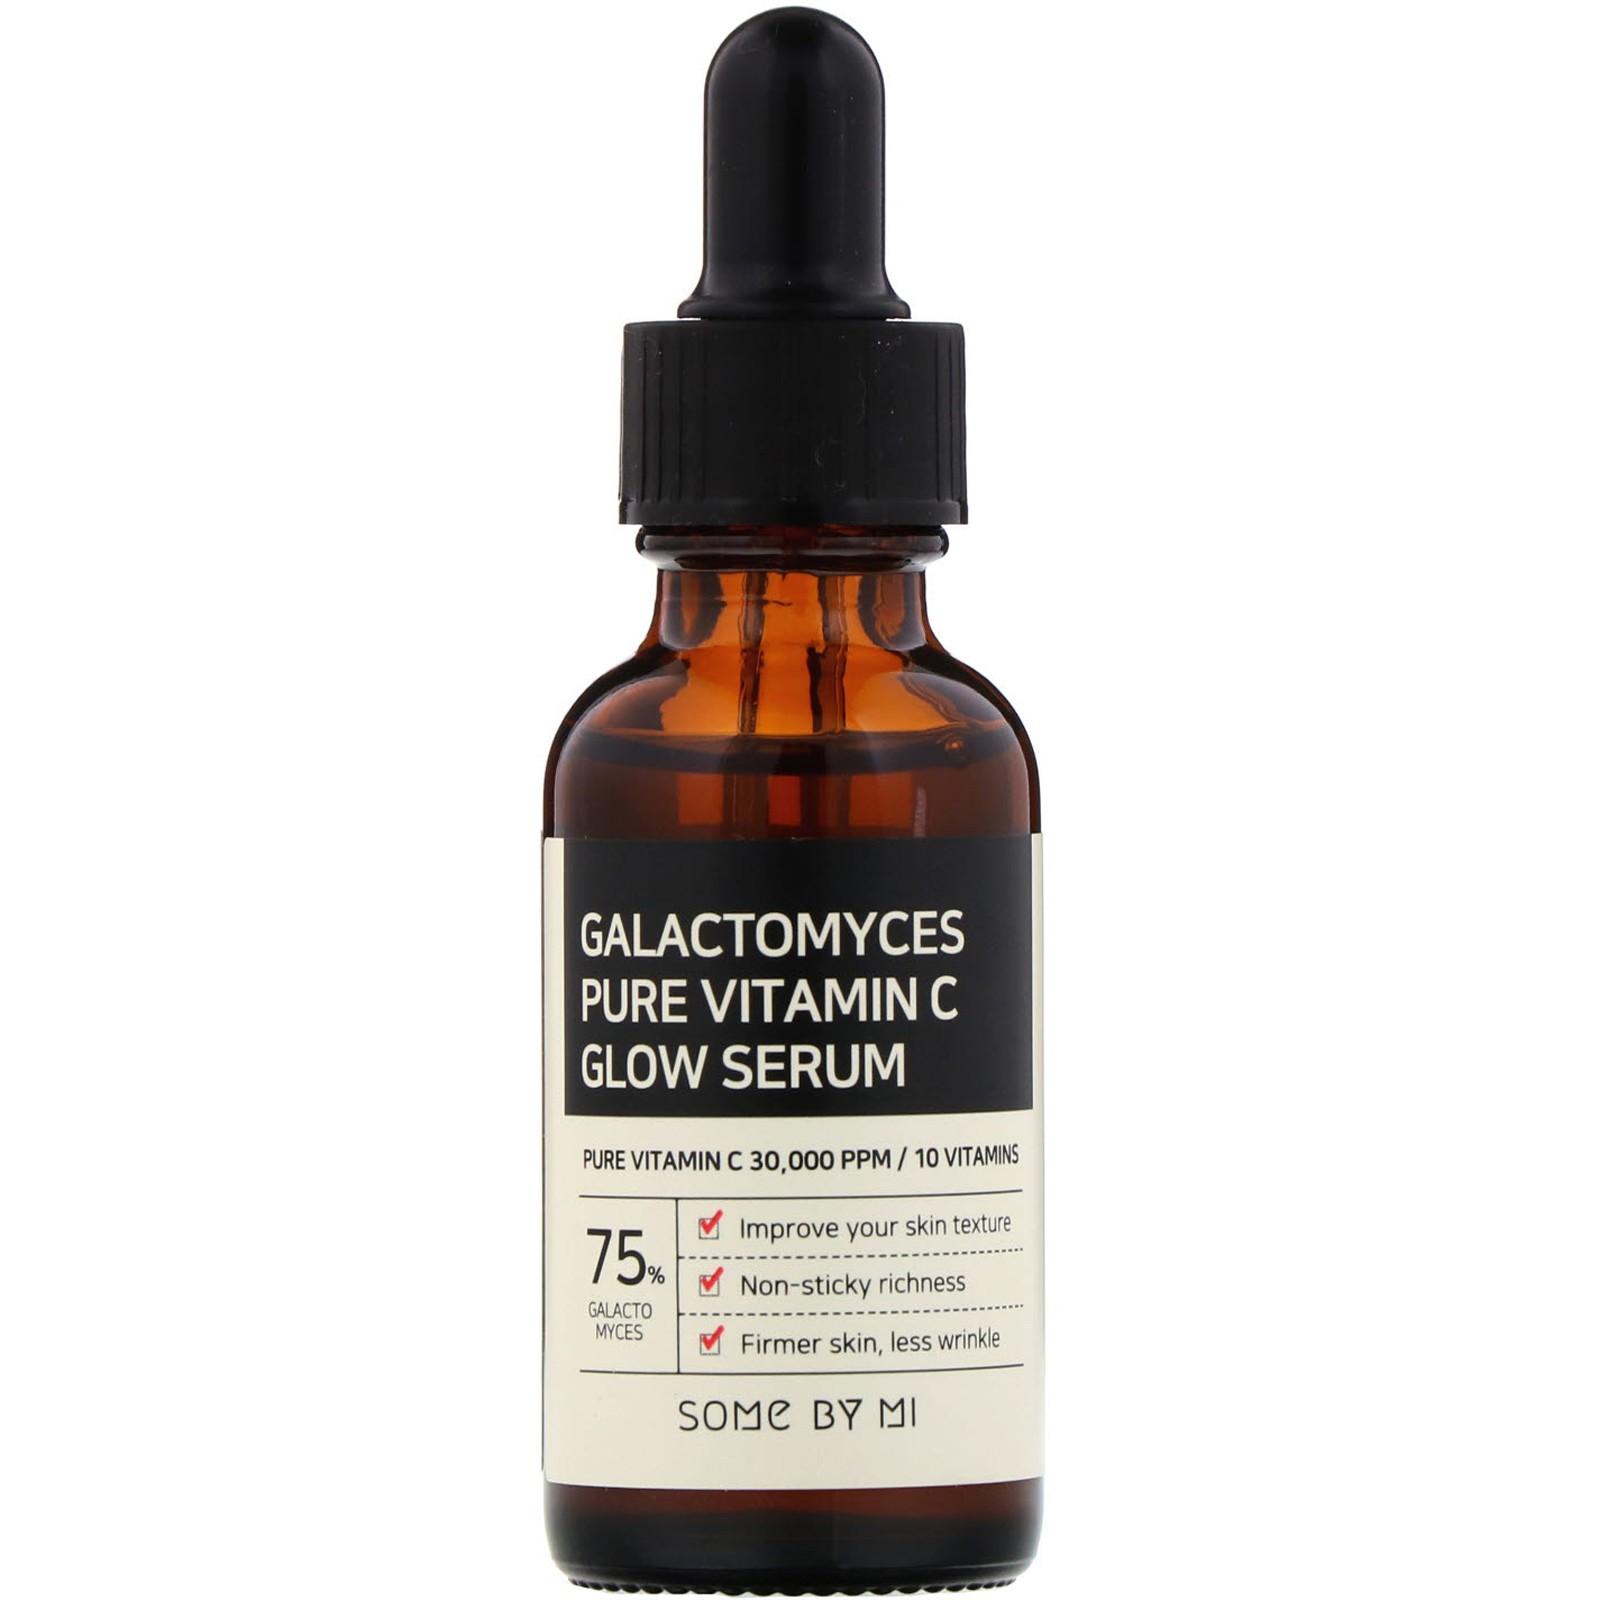 SOME BY MI Galactomyces Pure Vitamin C Glow Serum 30ml